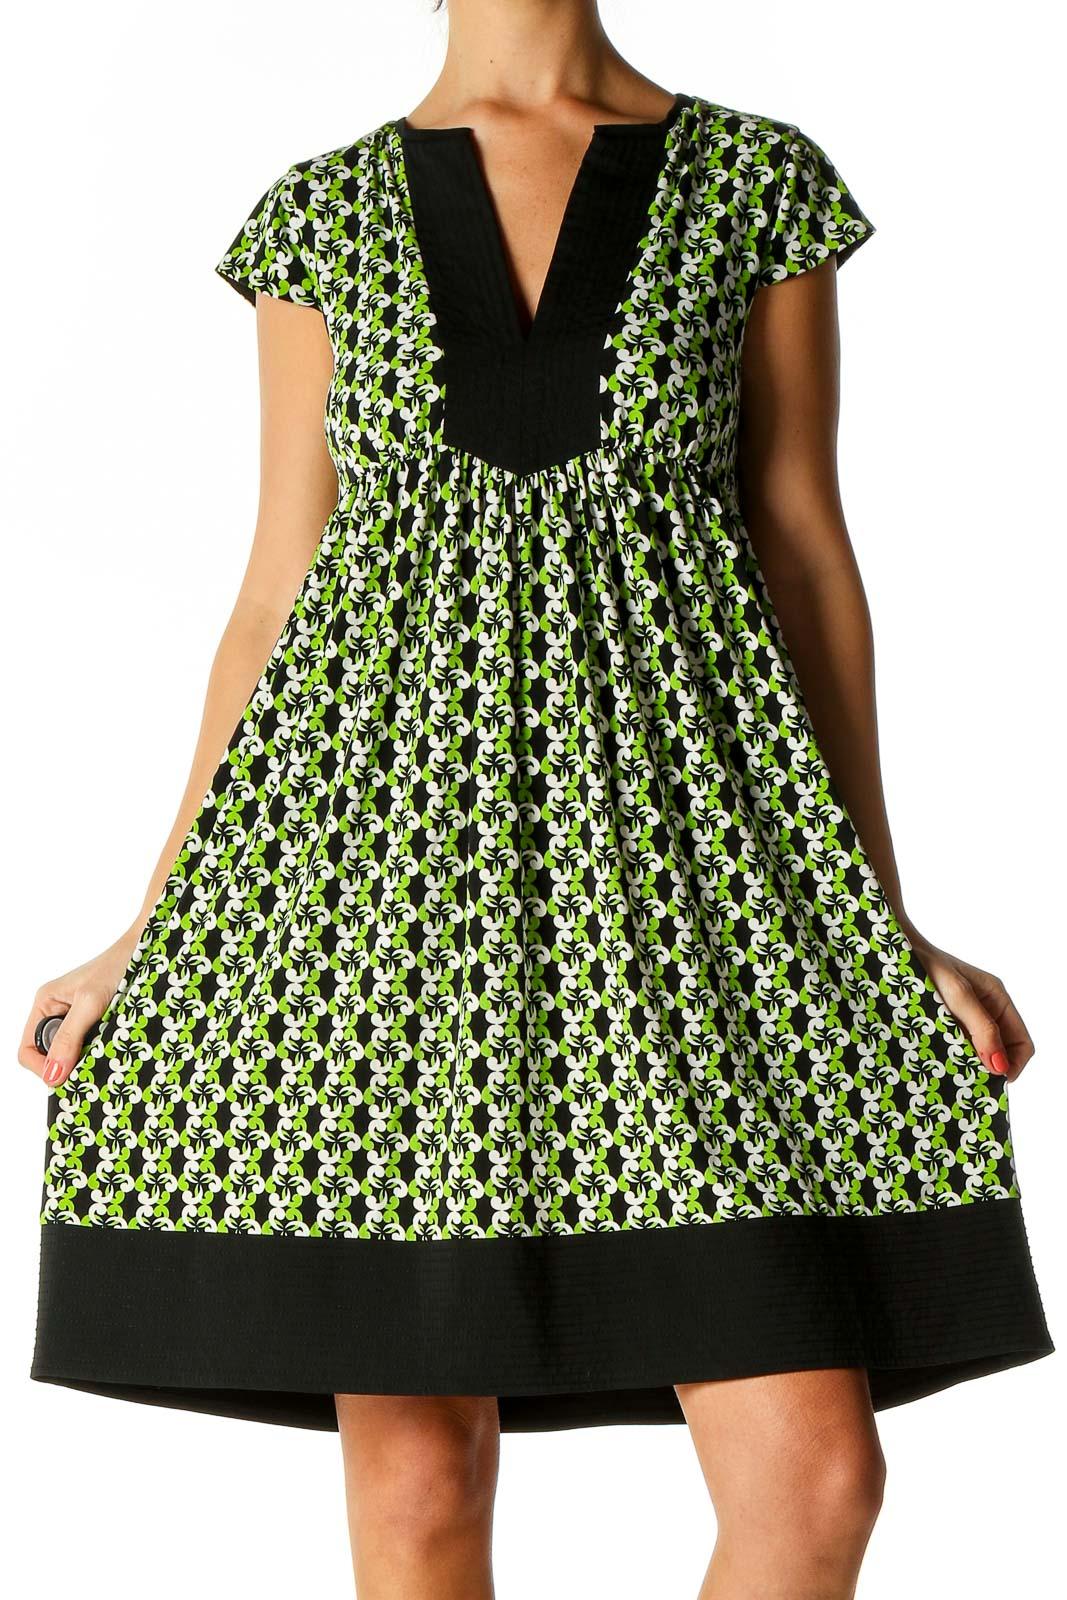 Black Polka Dot Bohemian Fit & Flare Dress Front